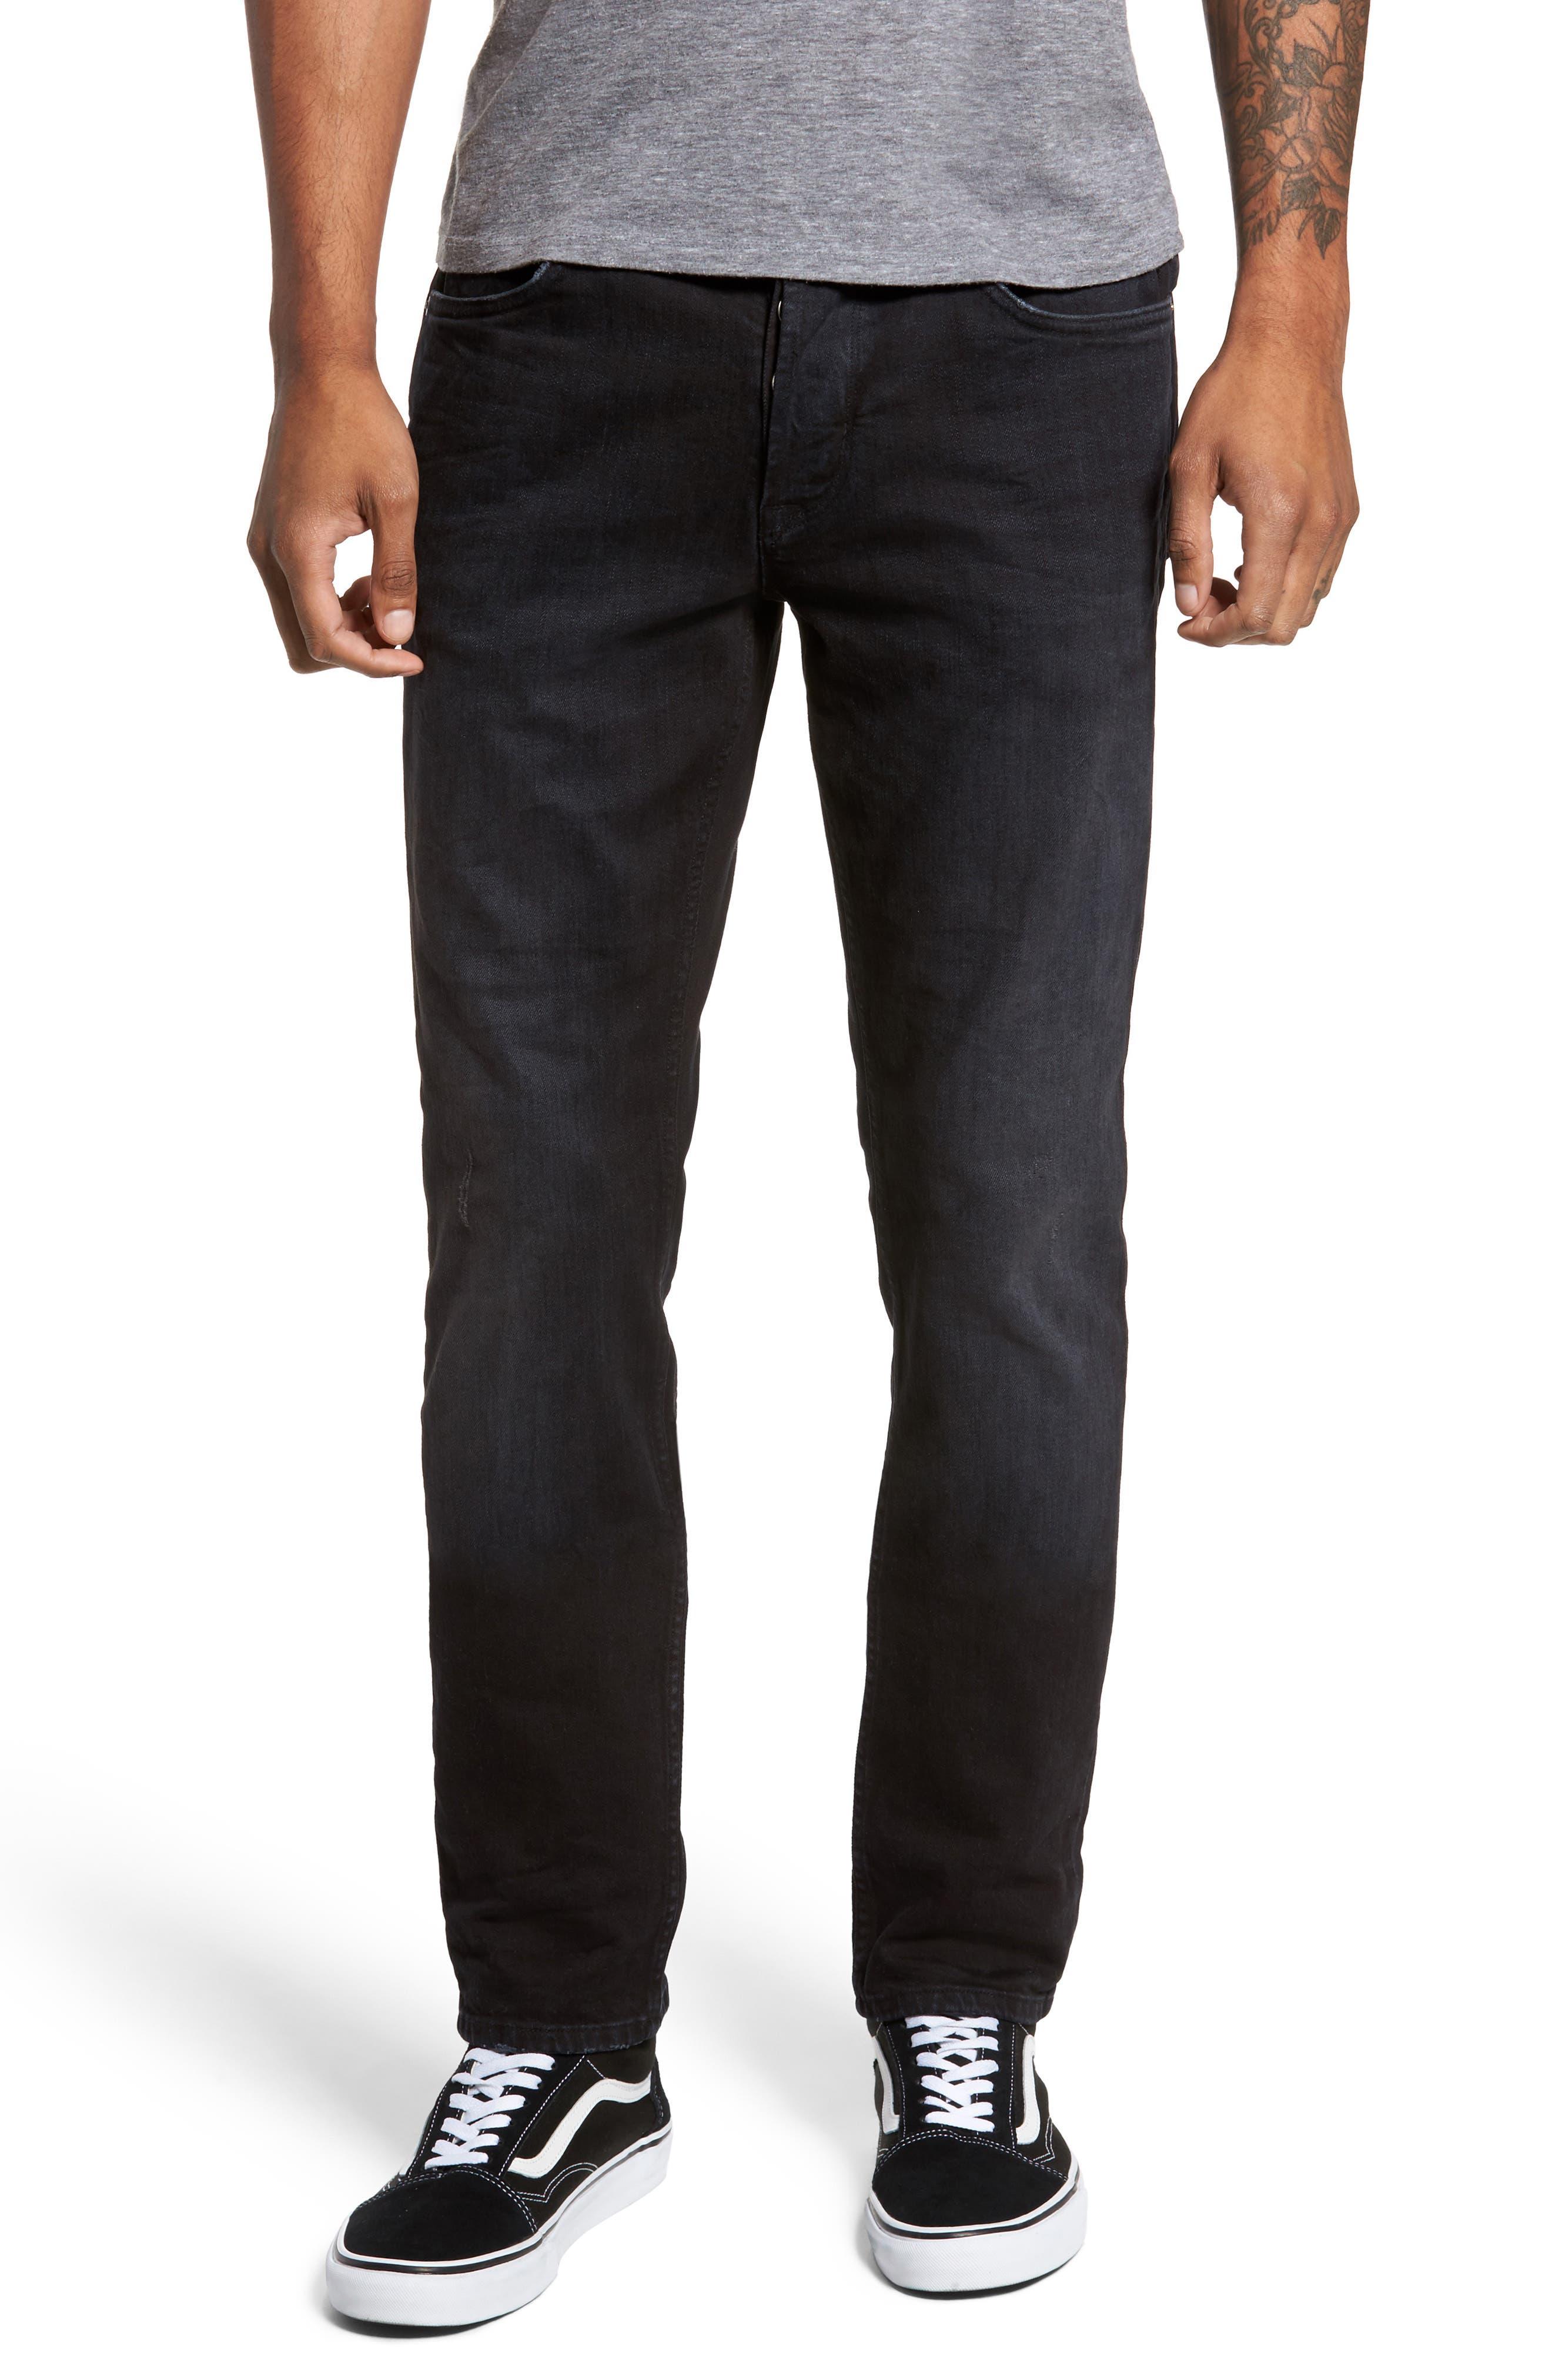 Main Image - Hudson Jeans Sartor Skinny Fit Jeans (Low Key)